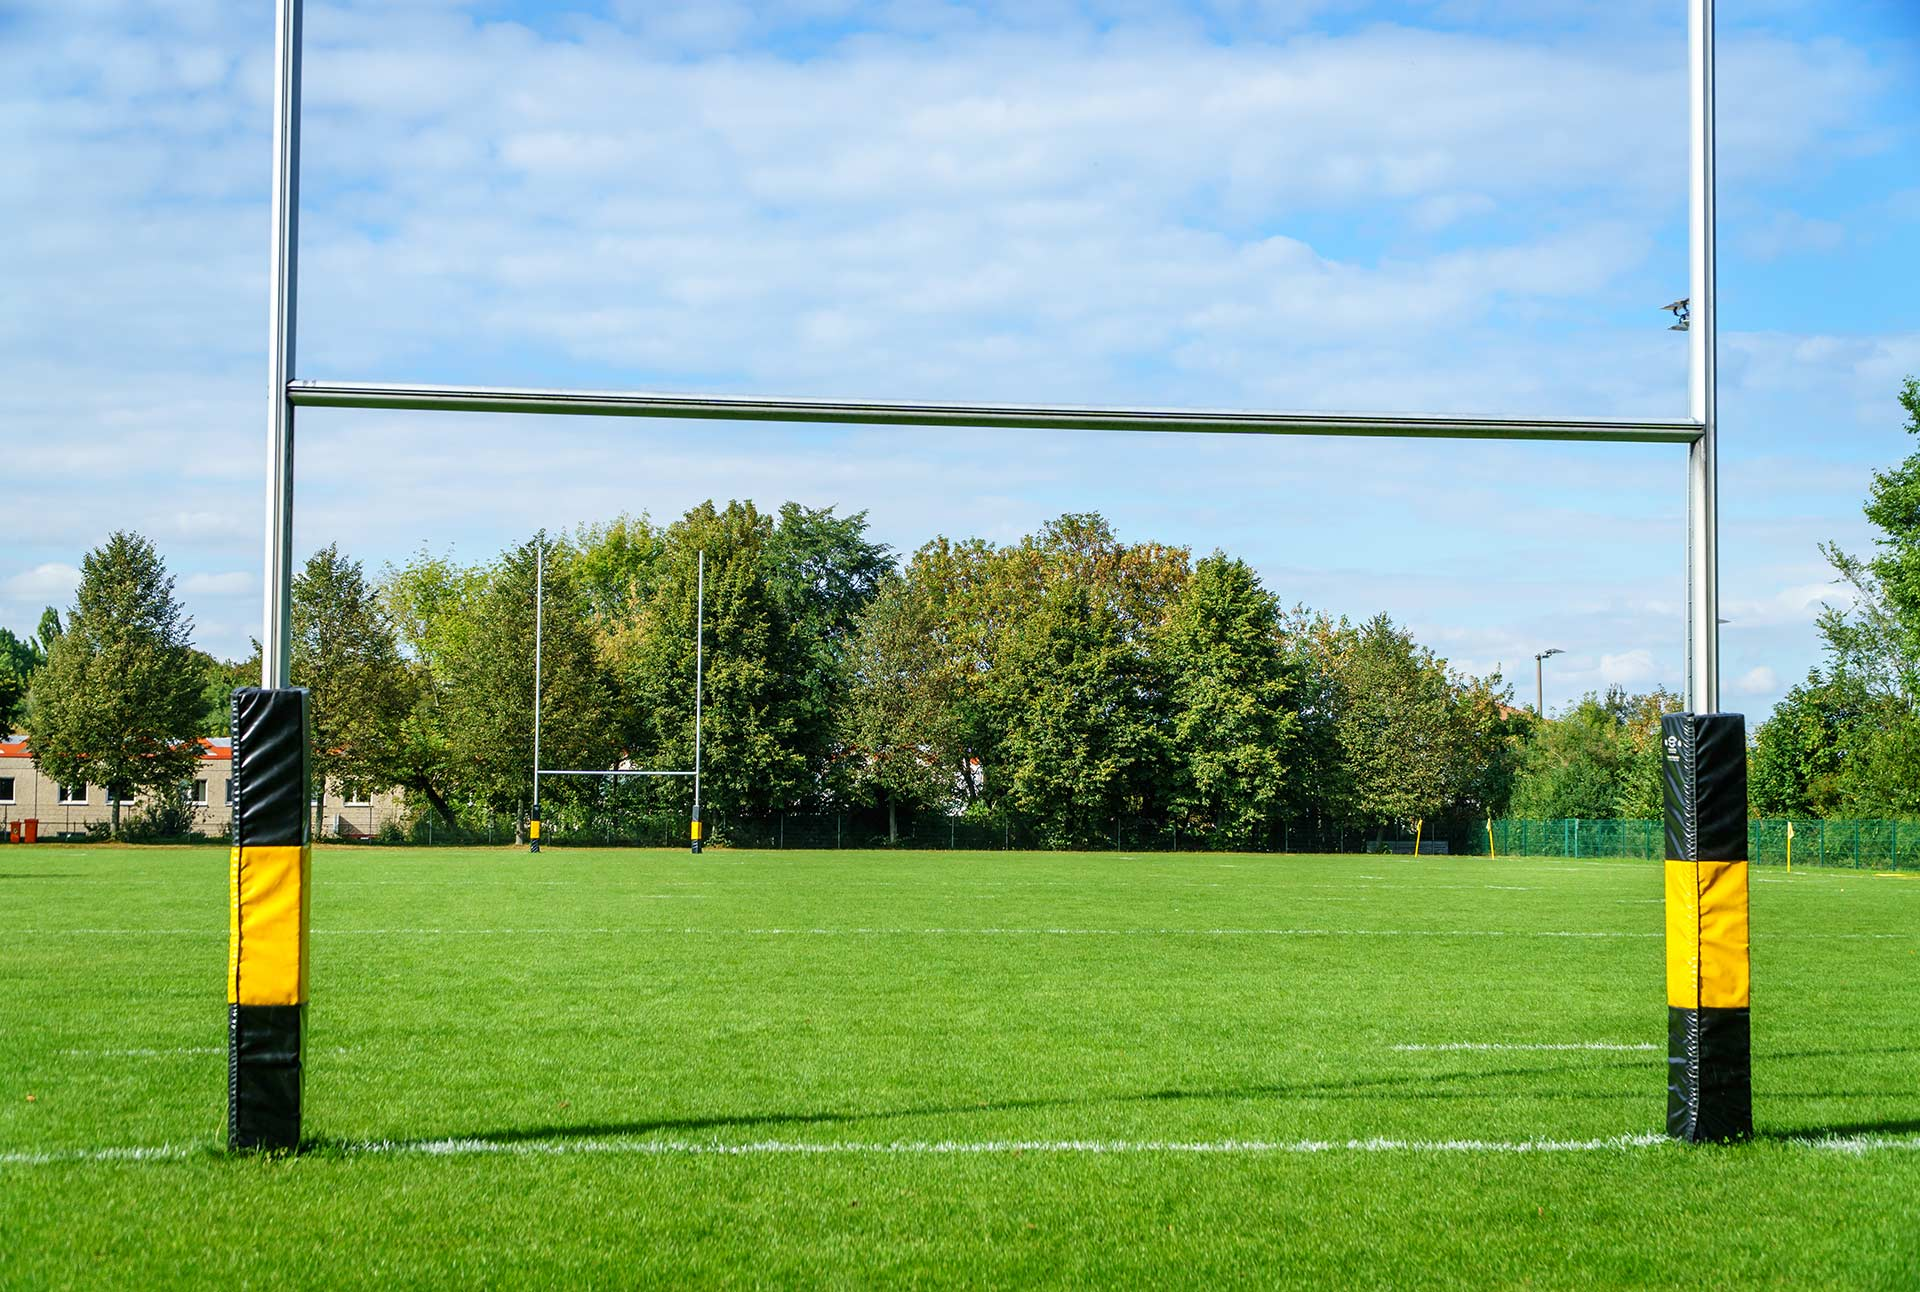 Field goals on a football field